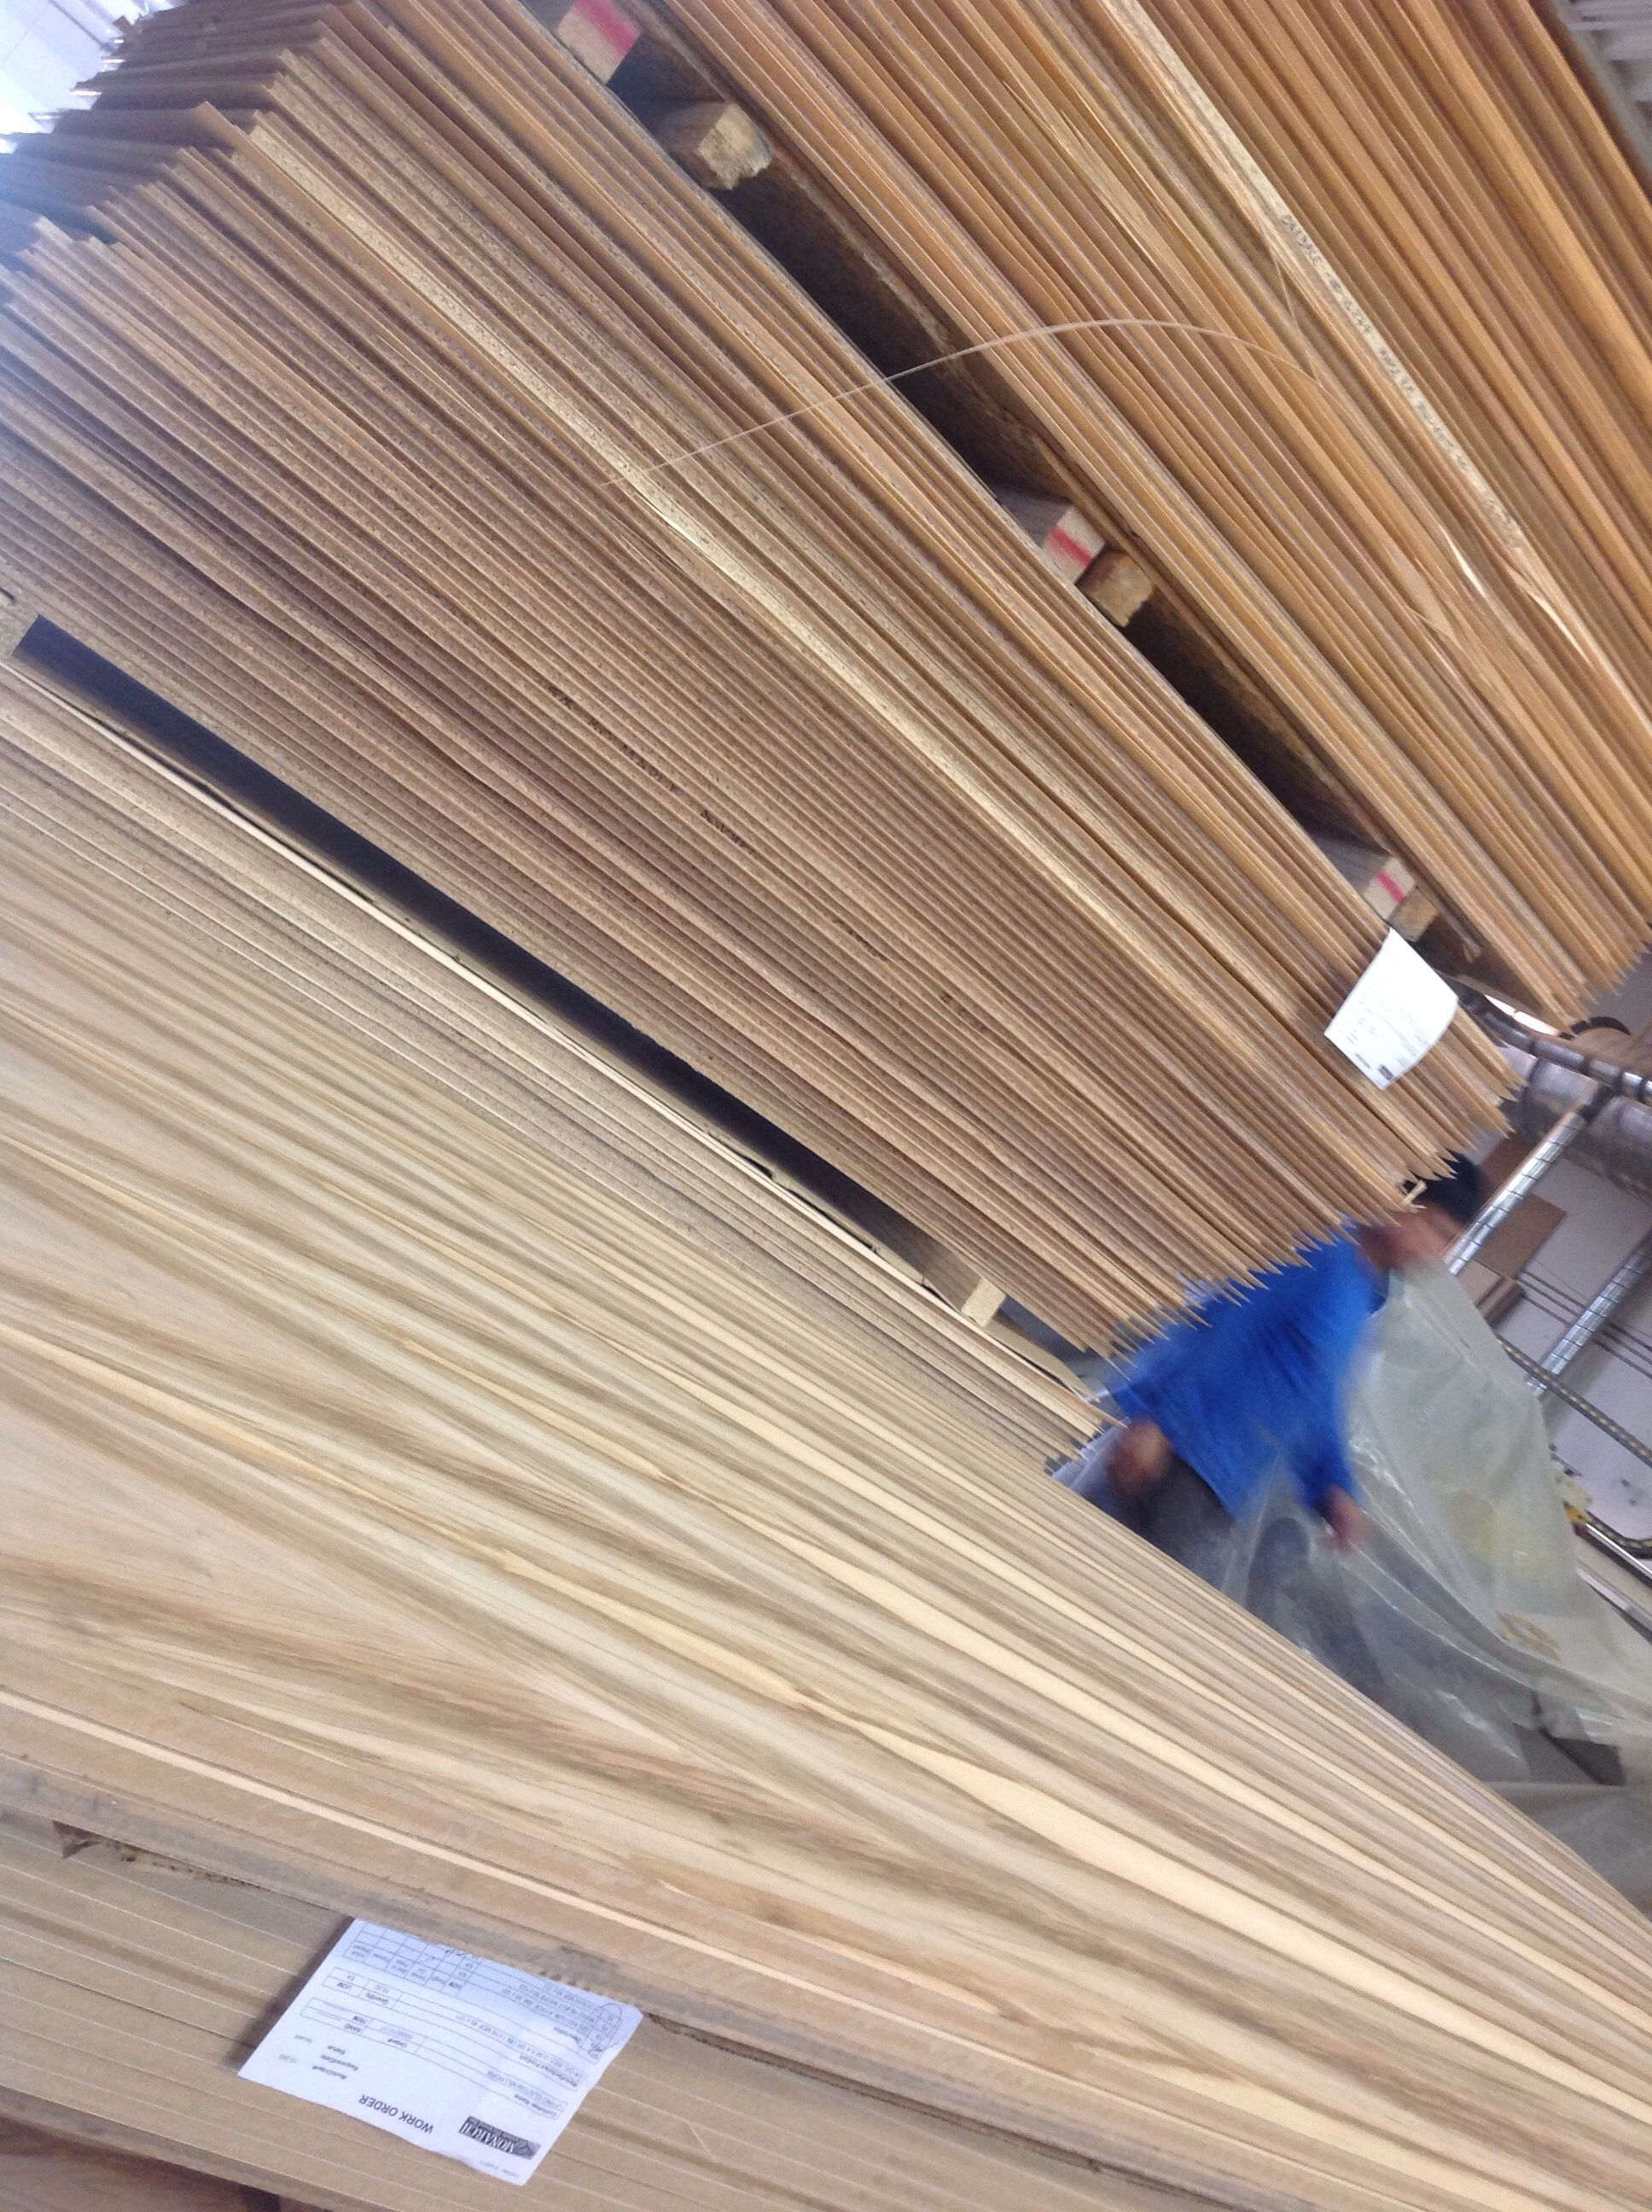 The Beauty Of Wood Hardwood Veneer Plywood Decor Design Veneer Plywood Hardwood Design Veneers